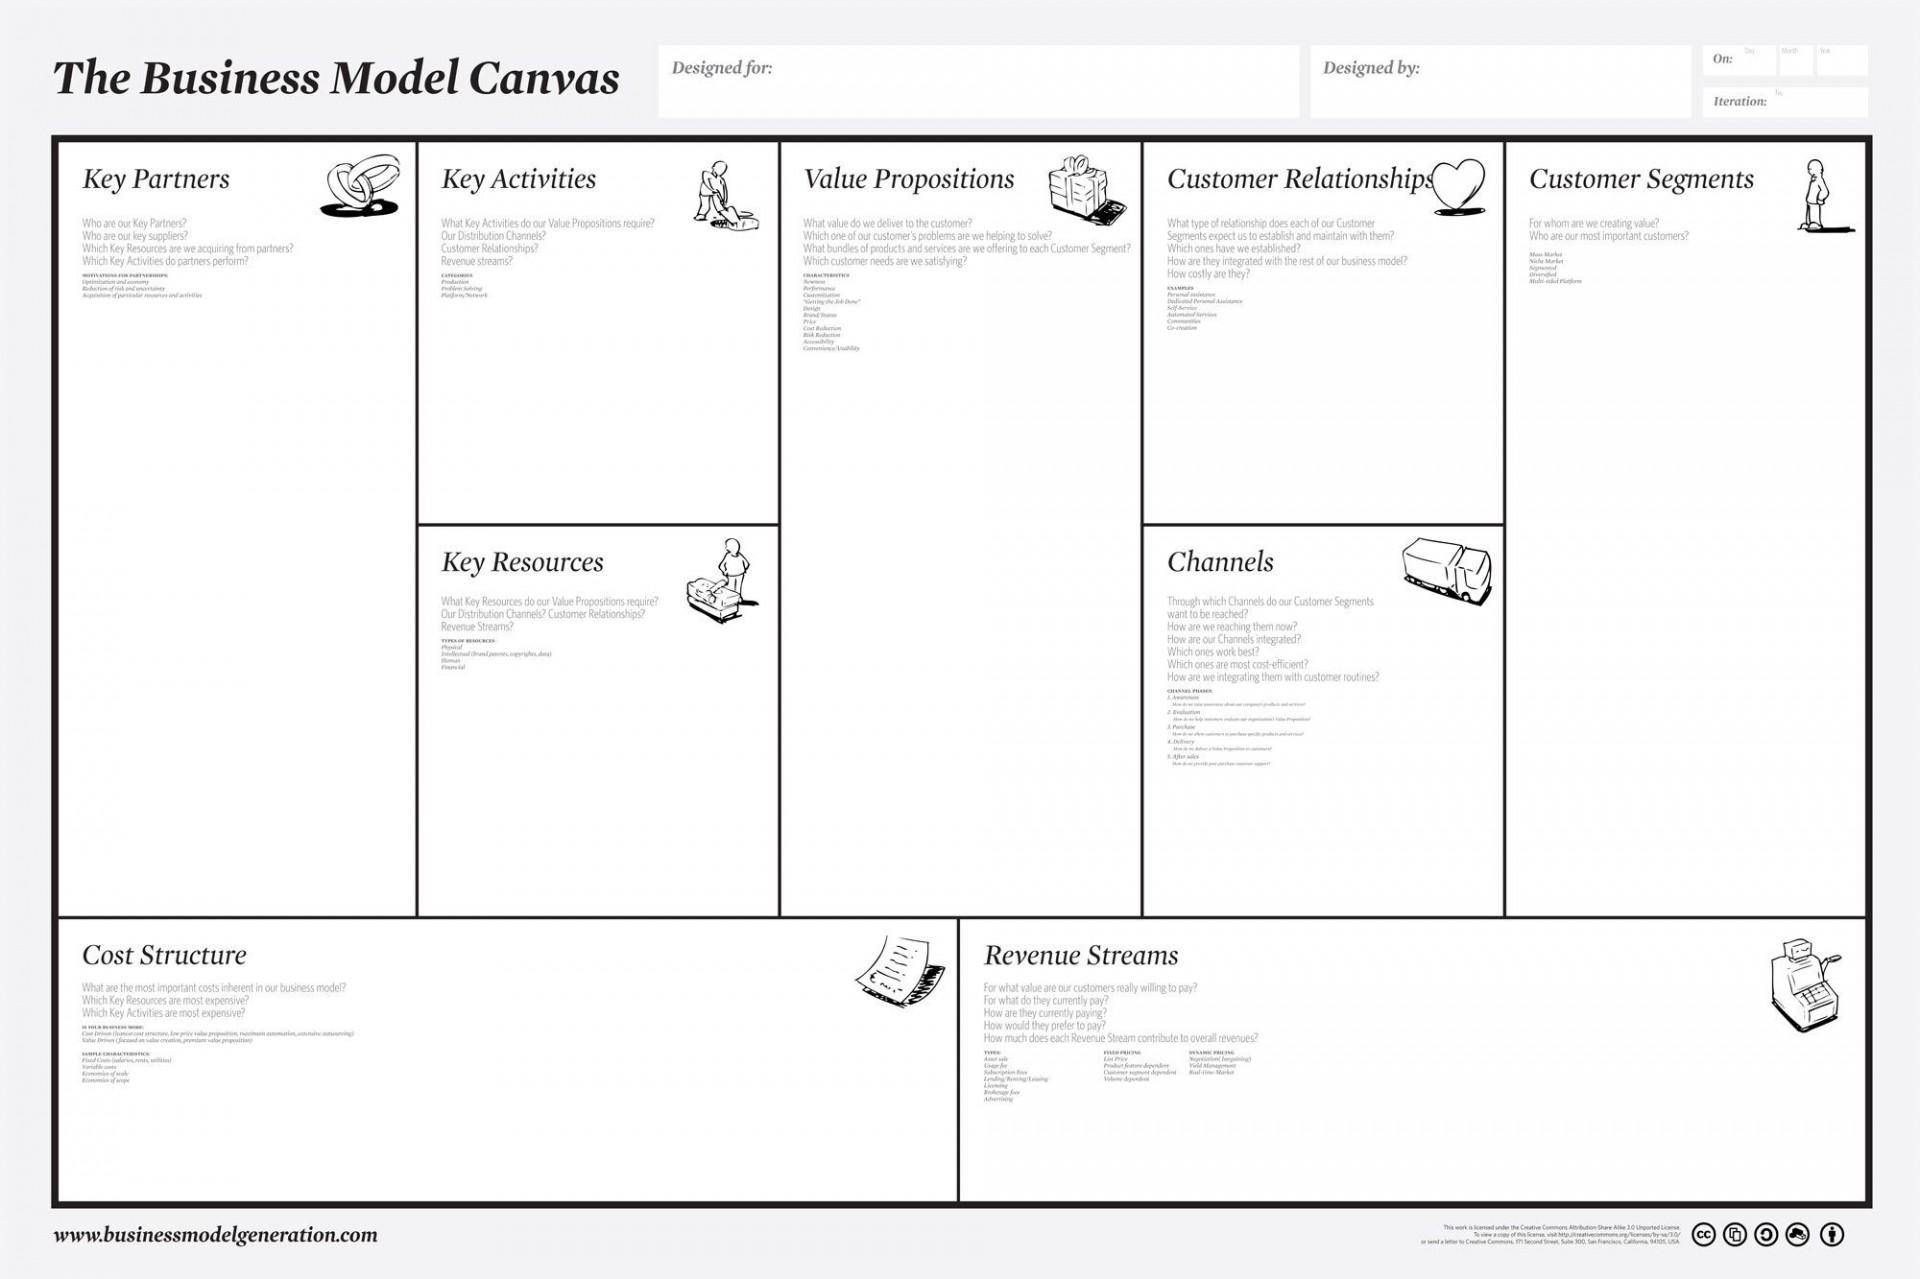 002 Fantastic Busines Model Canva Template Excel Deutsch Concept 1920